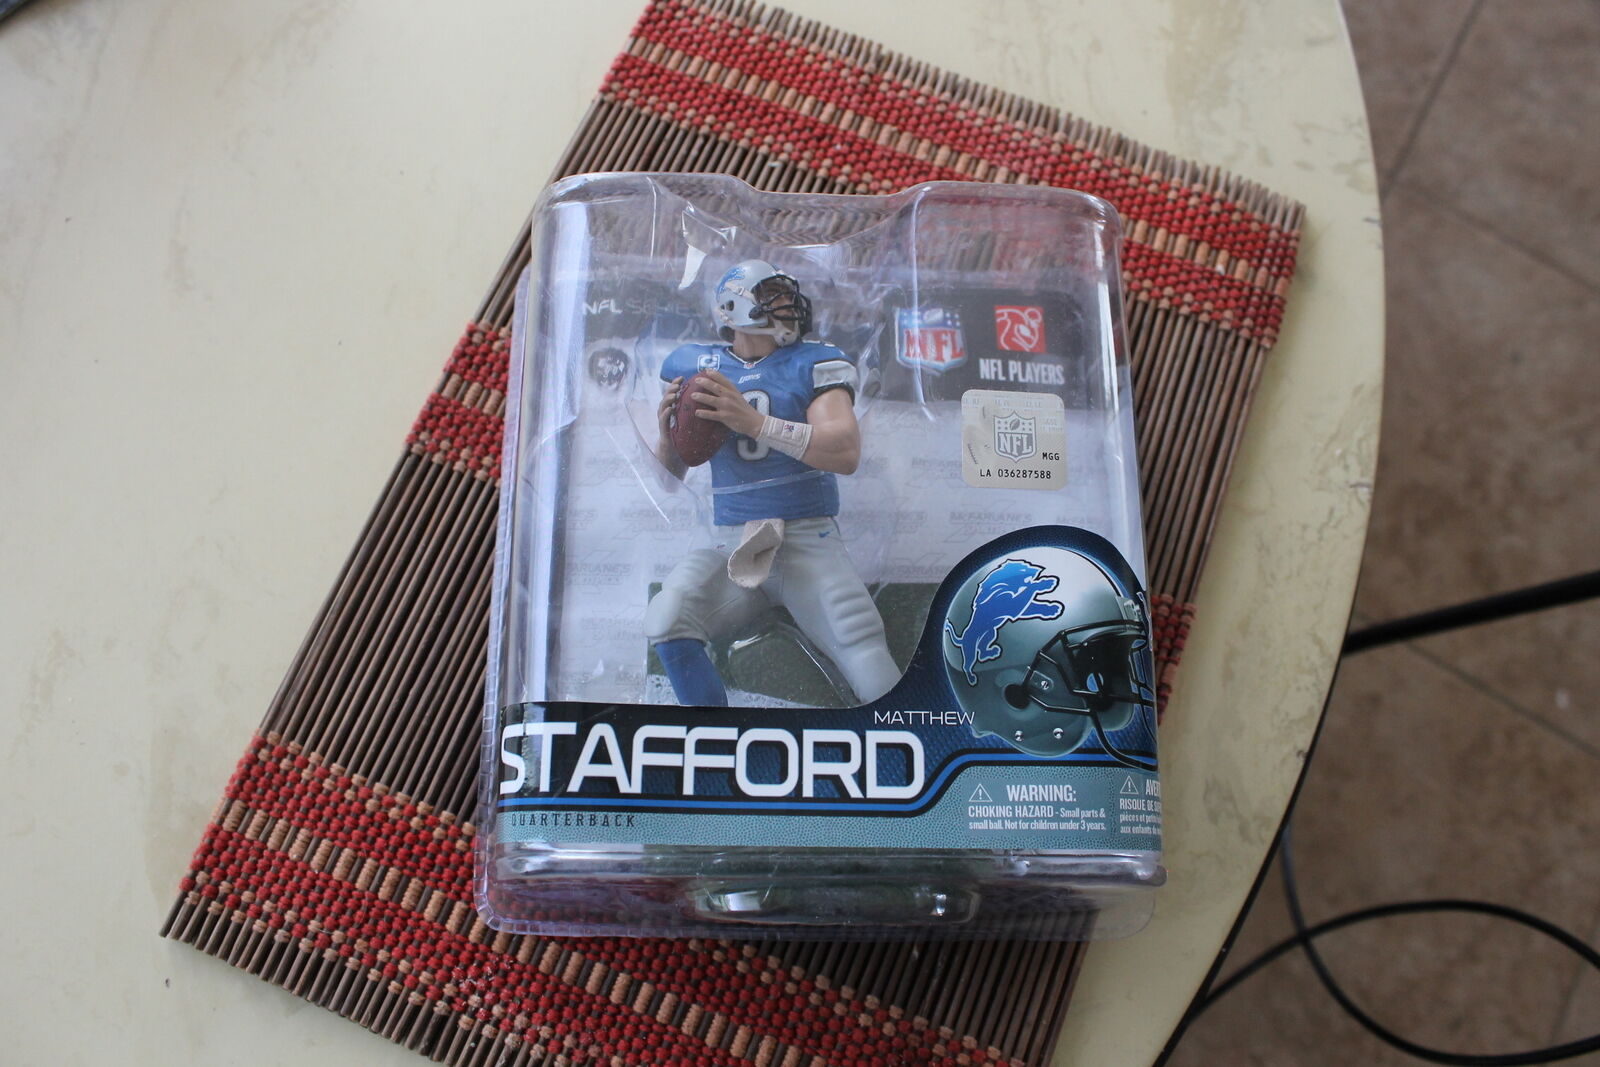 MATT STAFFORD, NFL 29, SHORT PRINTED  EXCLUSIVE  MCFARLANE, DETROIT LIONS